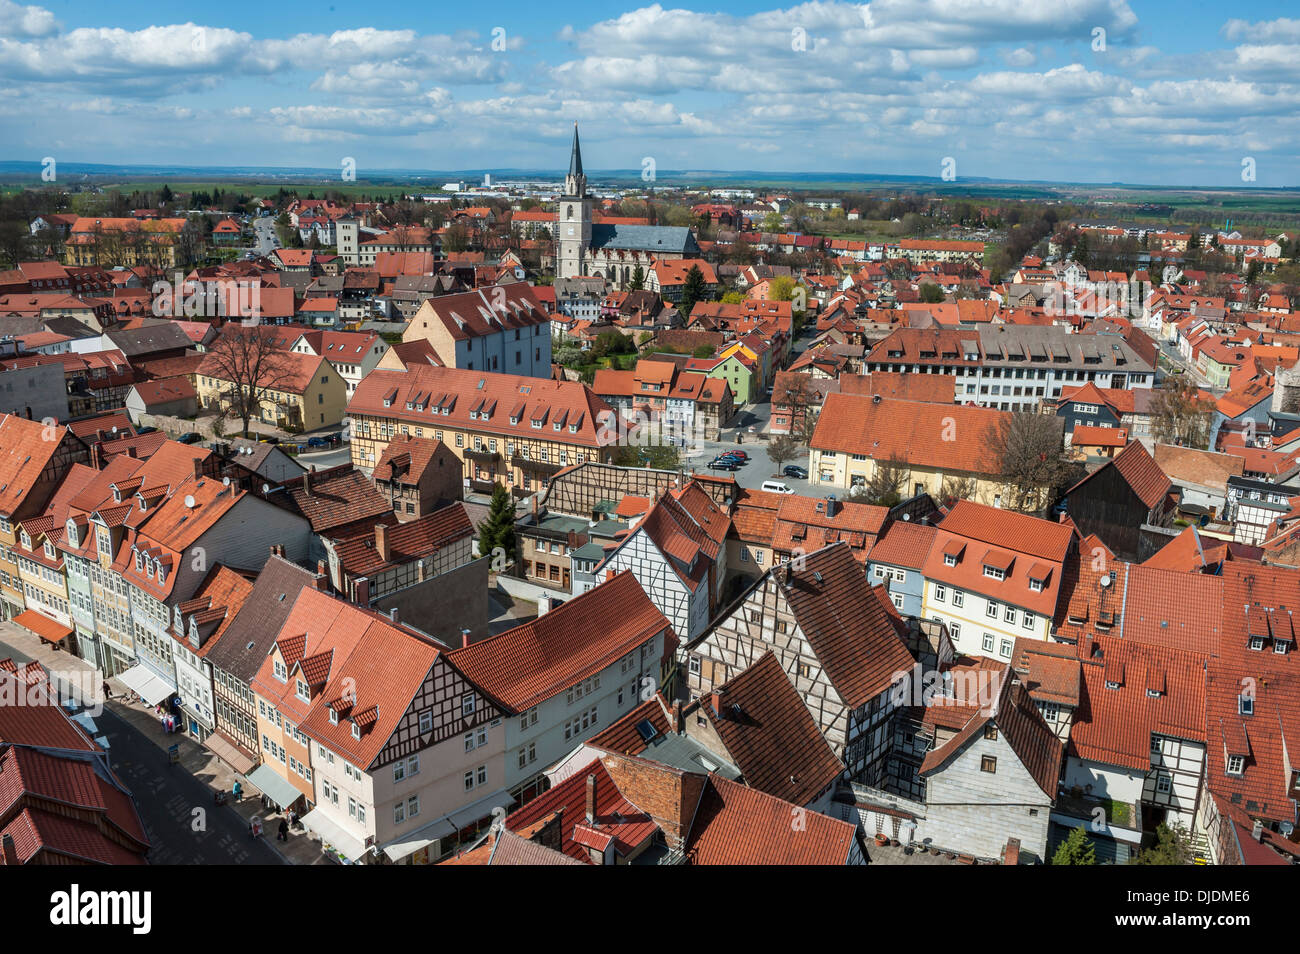 Centro histórico de Bad Langensalza, Turingia, Alemania Imagen De Stock